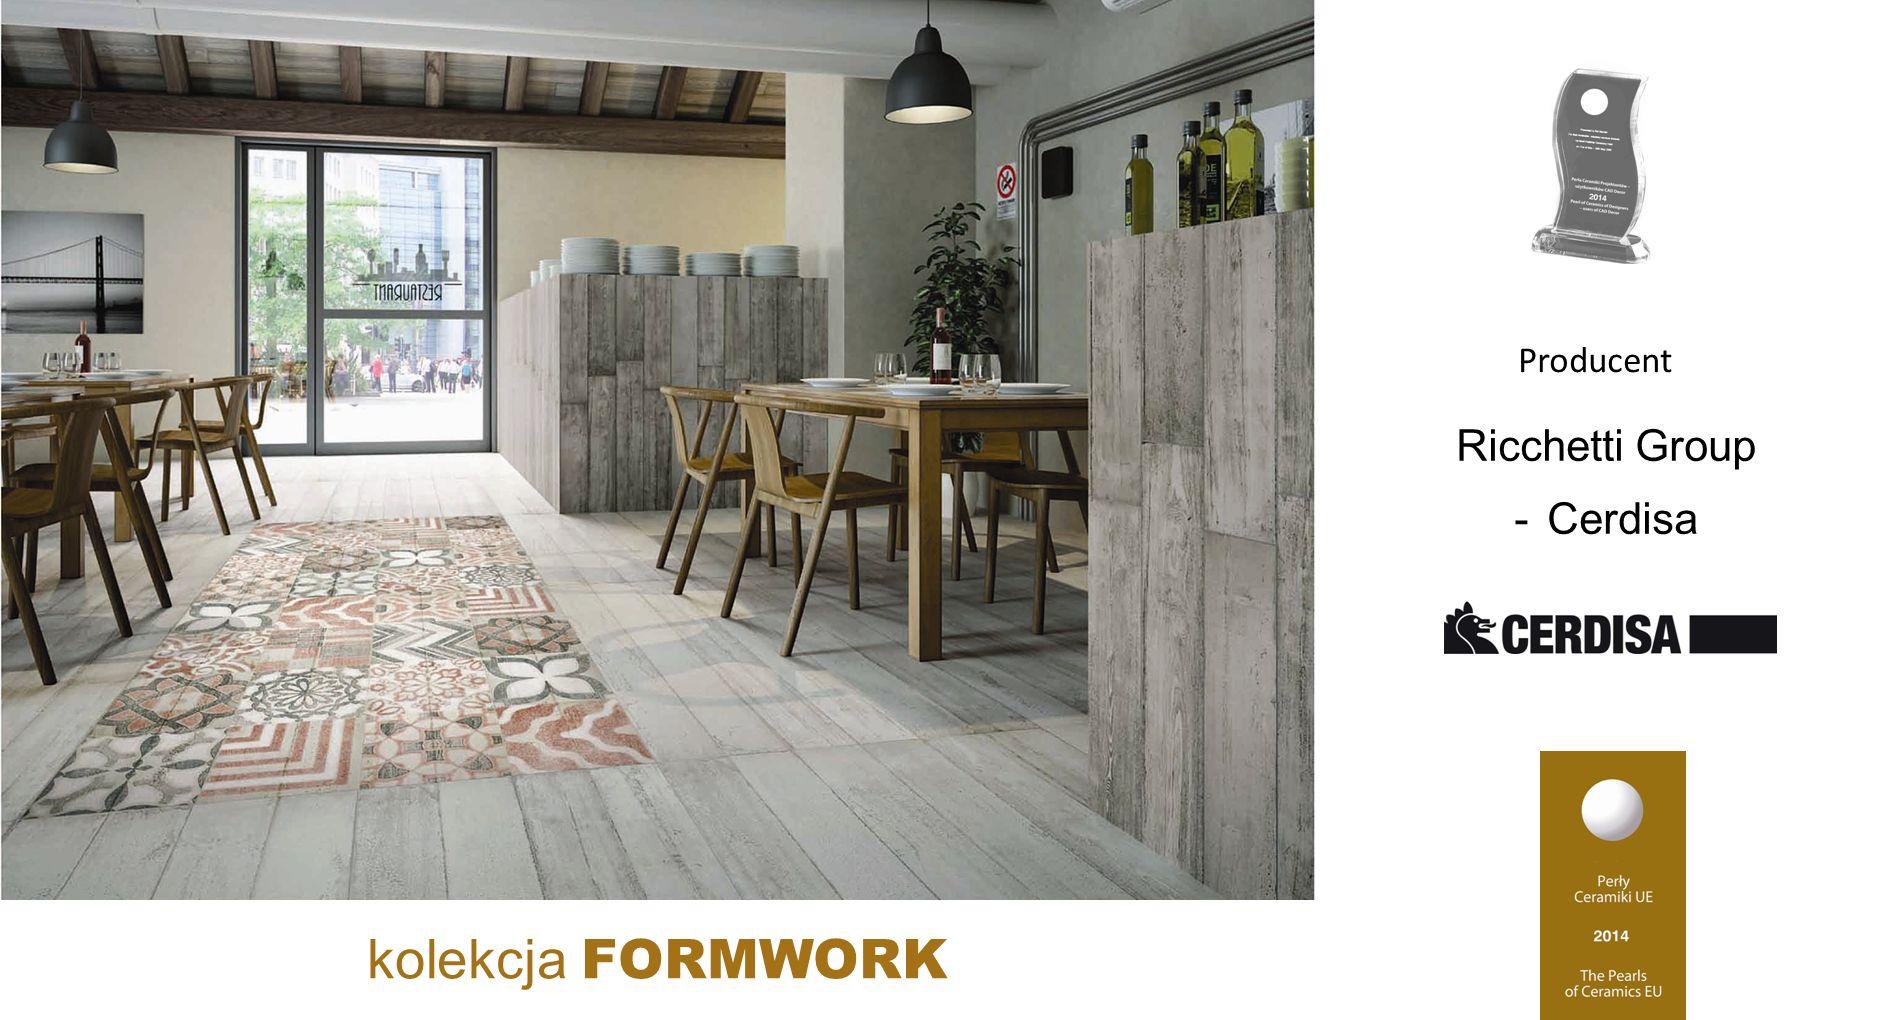 kolekcja FORMWORK Producent Ricchetti Group - Cerdisa